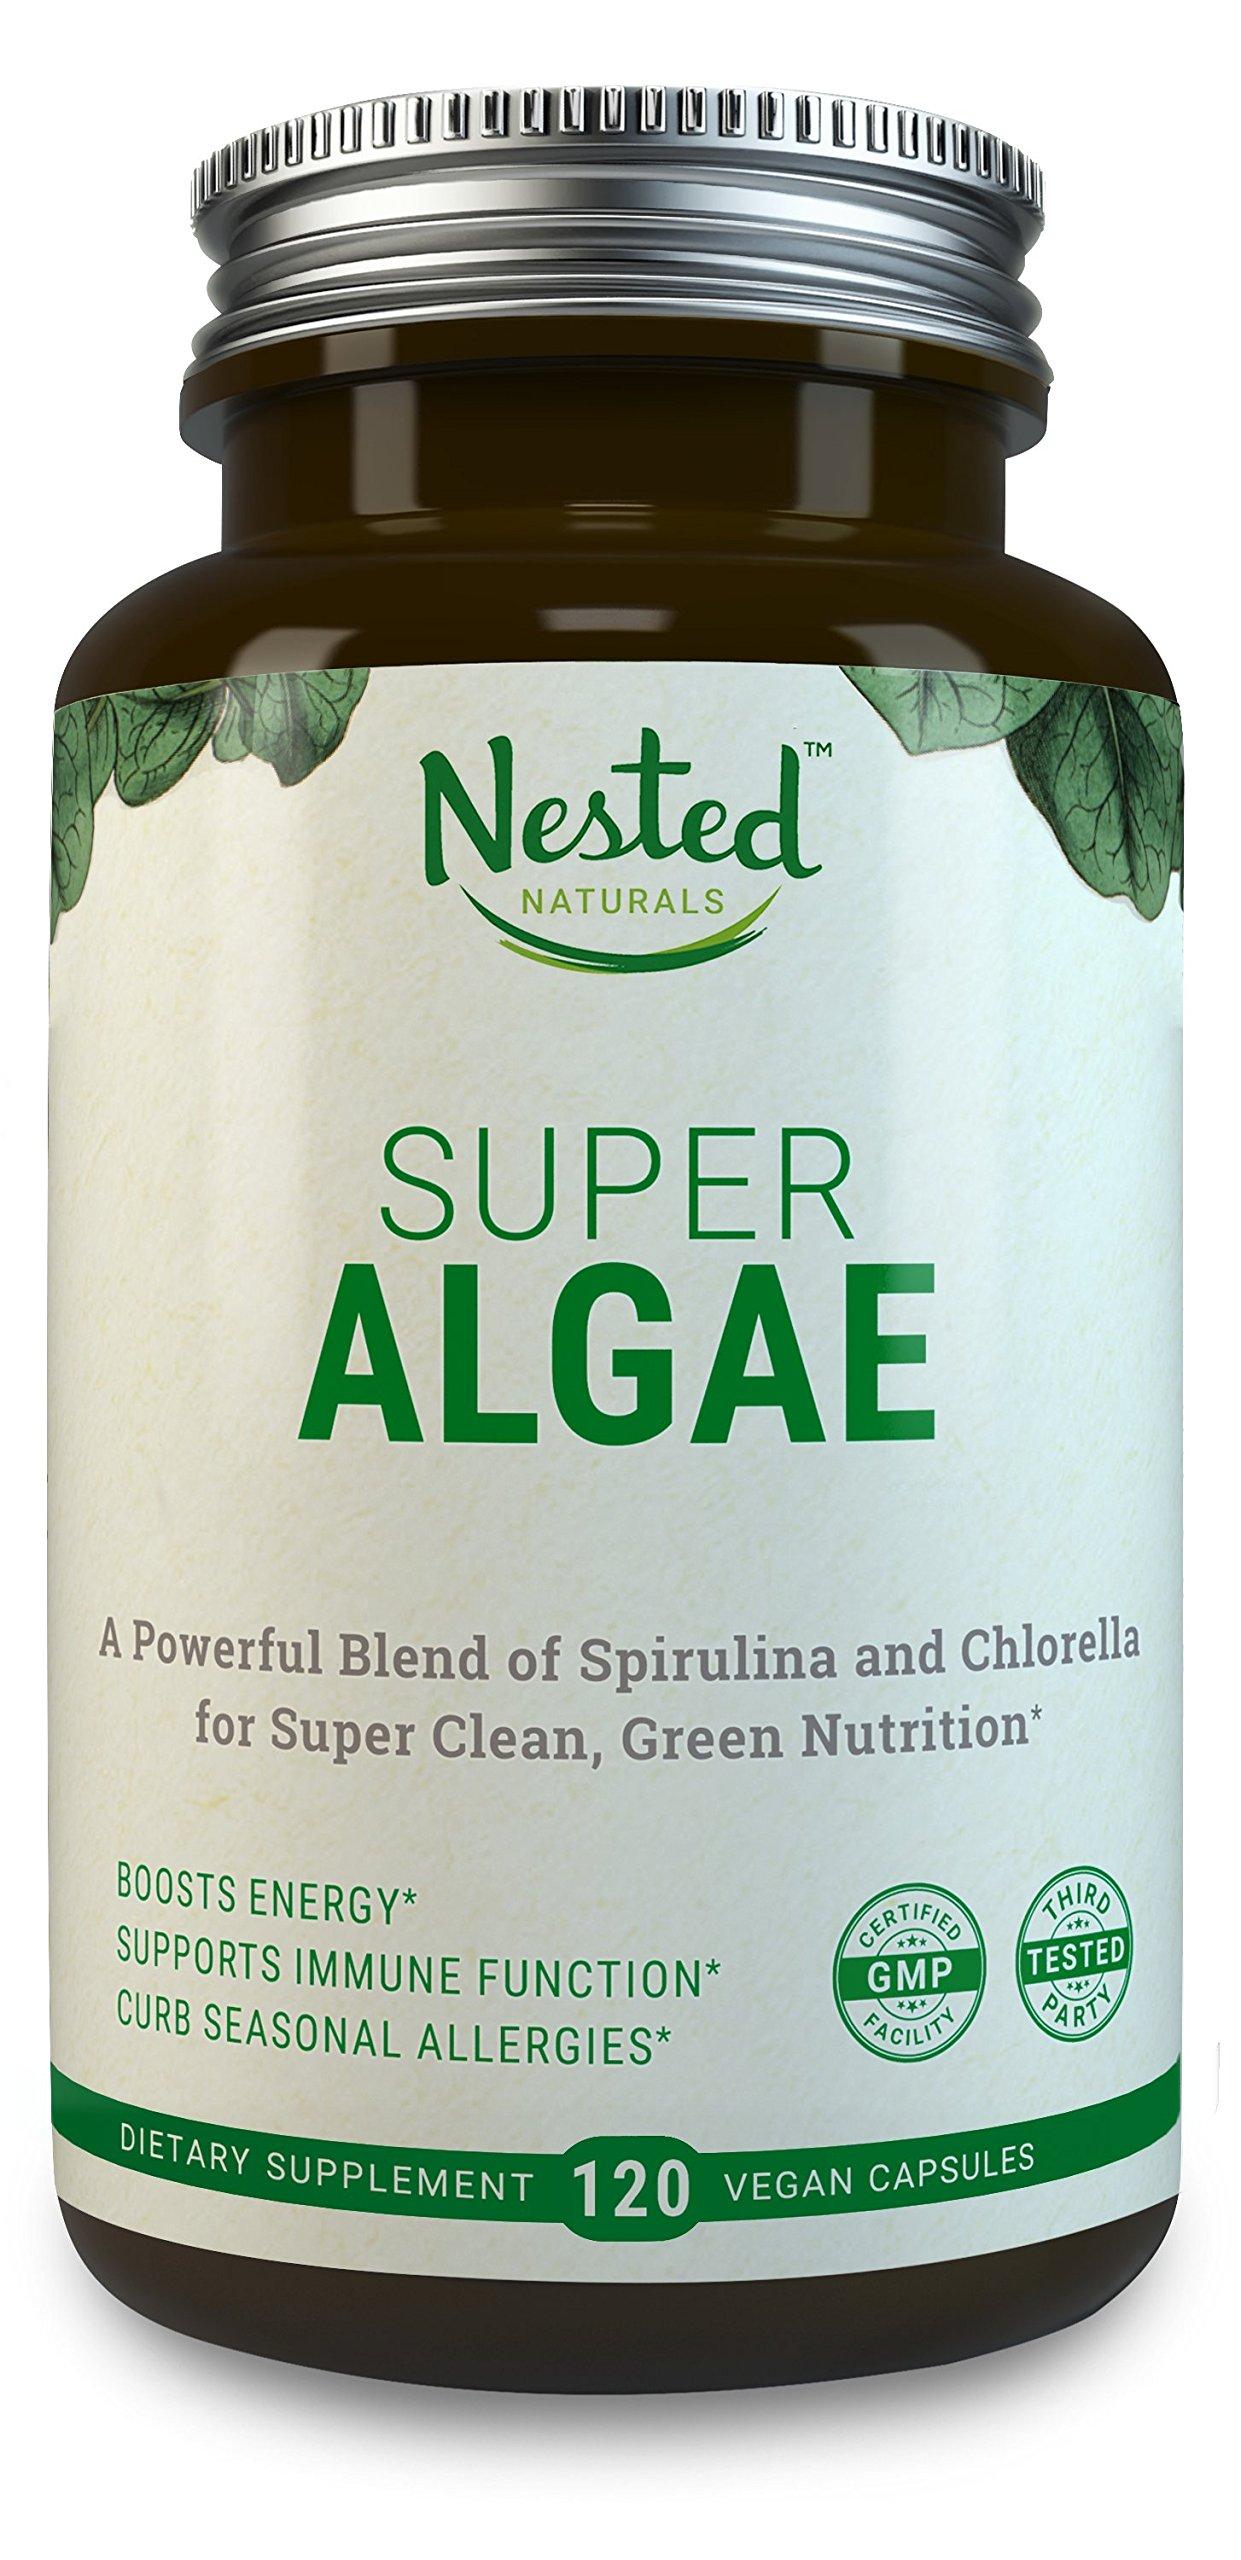 SUPER ALGAE 500mg | 120 Vegan Capsules | 50/50 Spirulina + Chlorella Powder, 100% Non GMO | Antioxidant Superfood, Natural Detox, Body Cleanse & Gut Health Booster | Blue Green Algae Blend Supplement